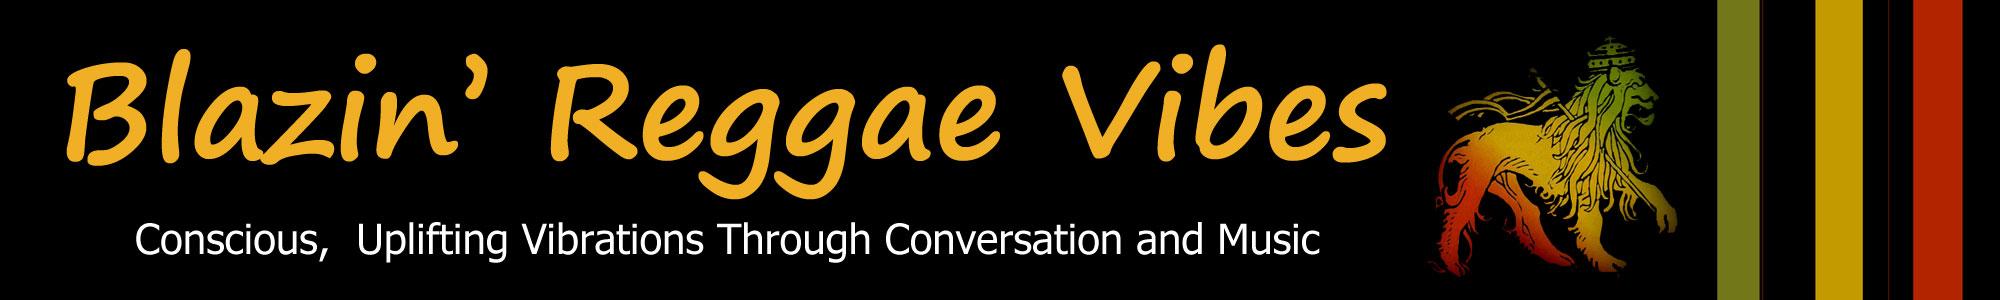 Blazin' Reggae Vibes Logo